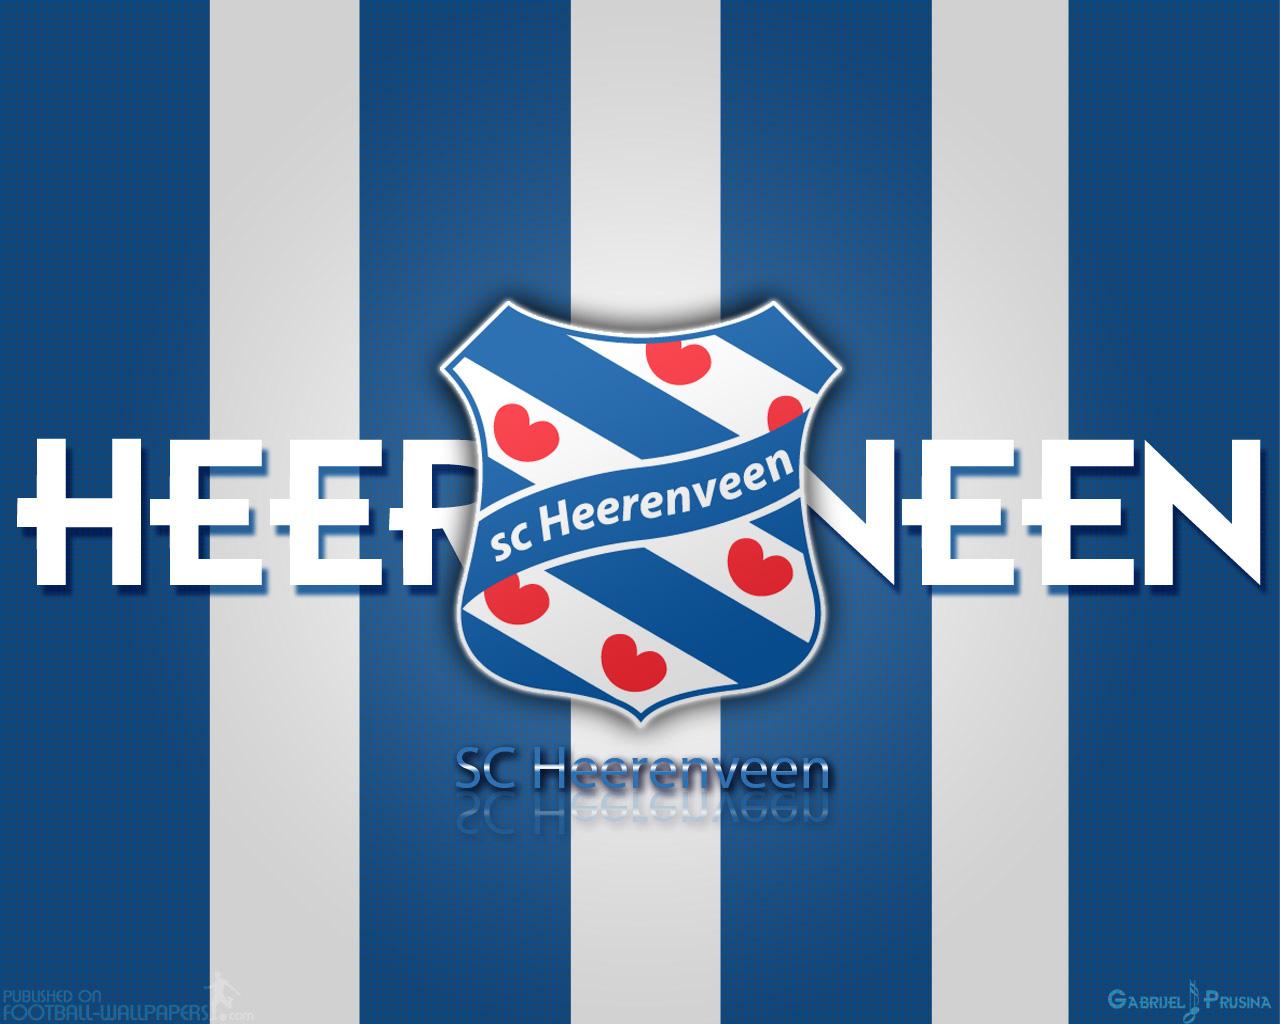 Chùm ảnh: SC Heerenveen jersey (34)